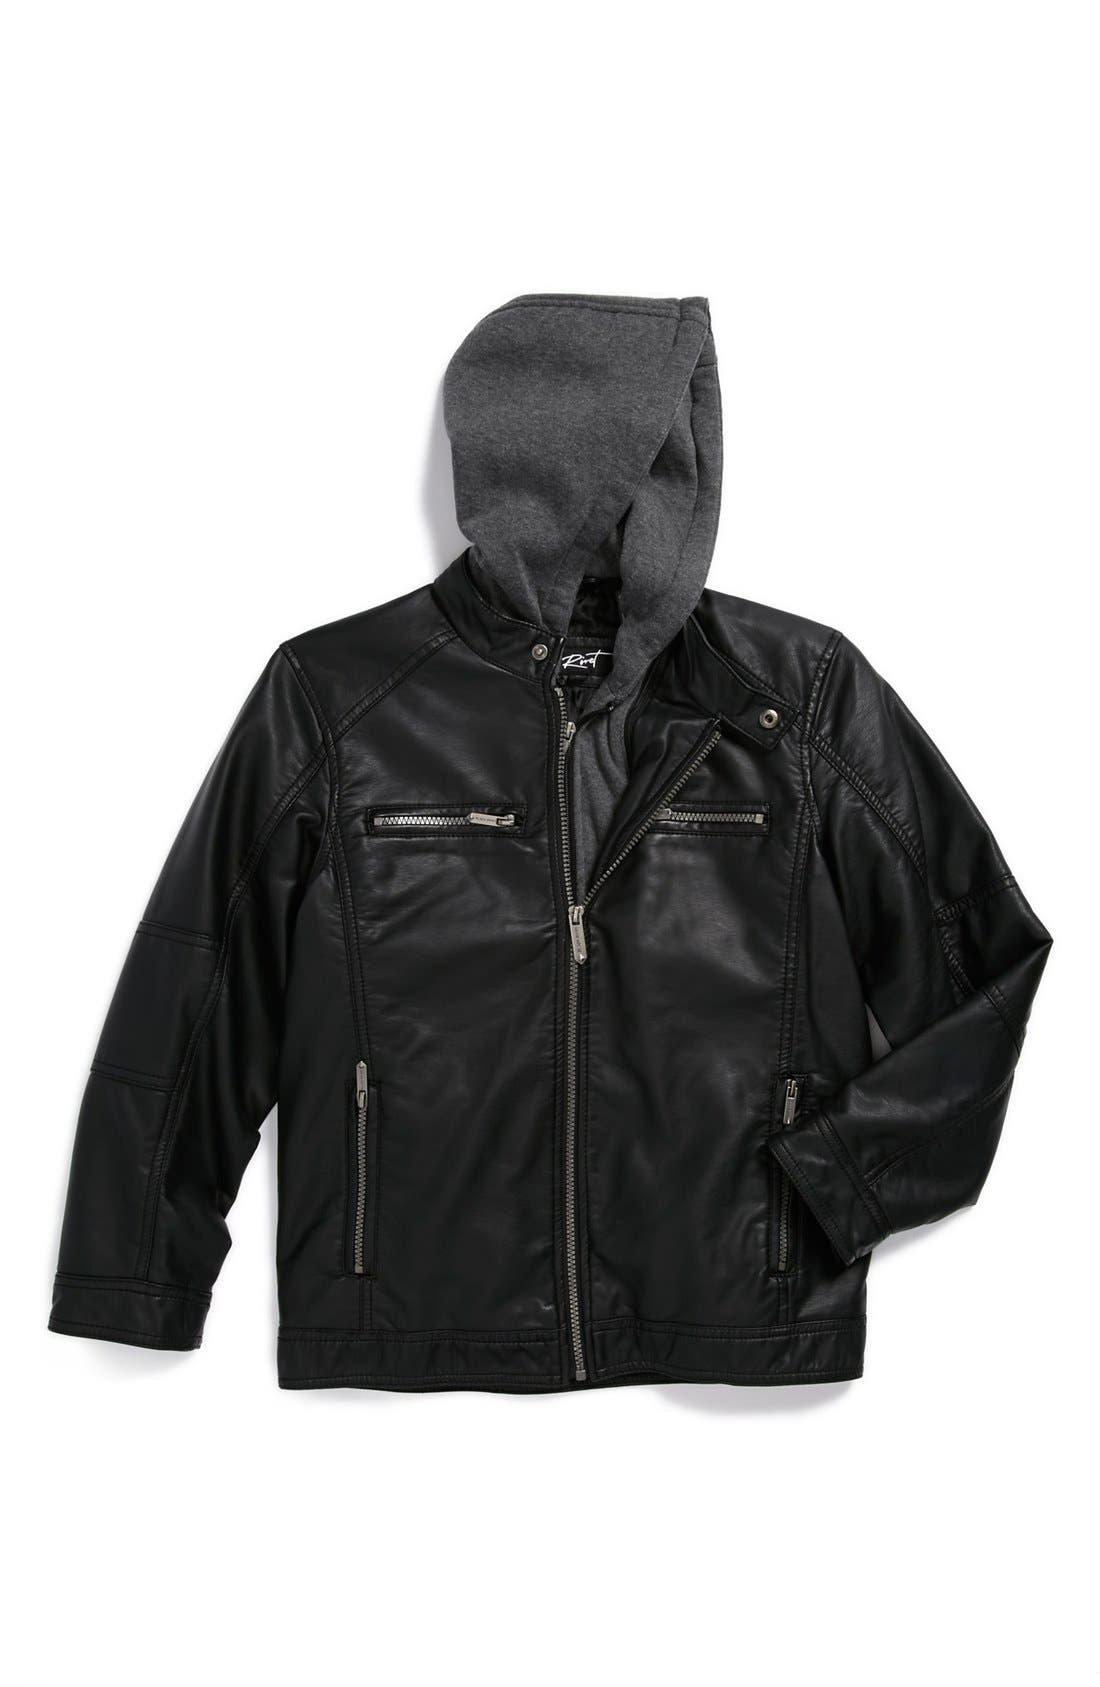 Alternate Image 1 Selected - Black Rivet Faux Leather Moto Jacket (Little Boys)